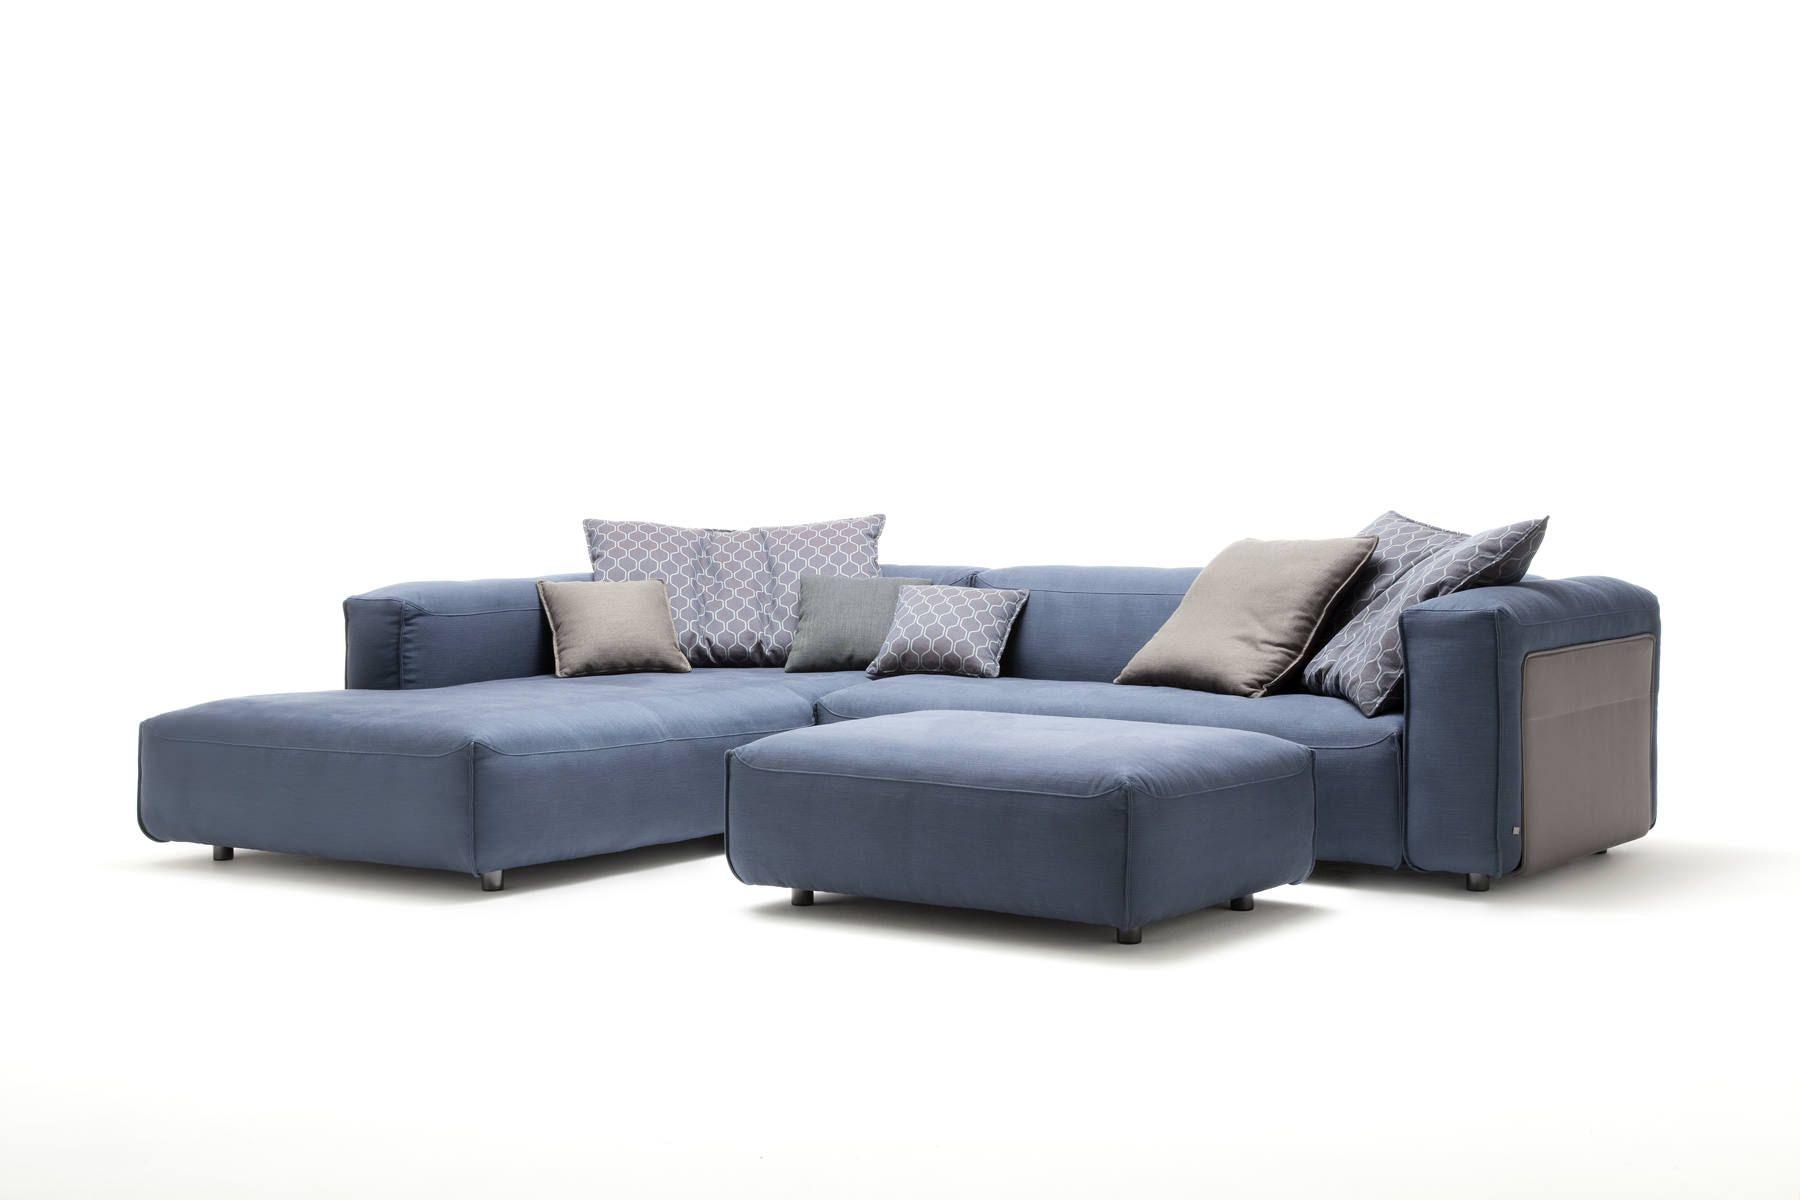 comfortable rolf benz sofa. Excellent-Blue-Rolf-Benz-Sofa-Plura-that-Elbow- Comfortable Rolf Benz Sofa M